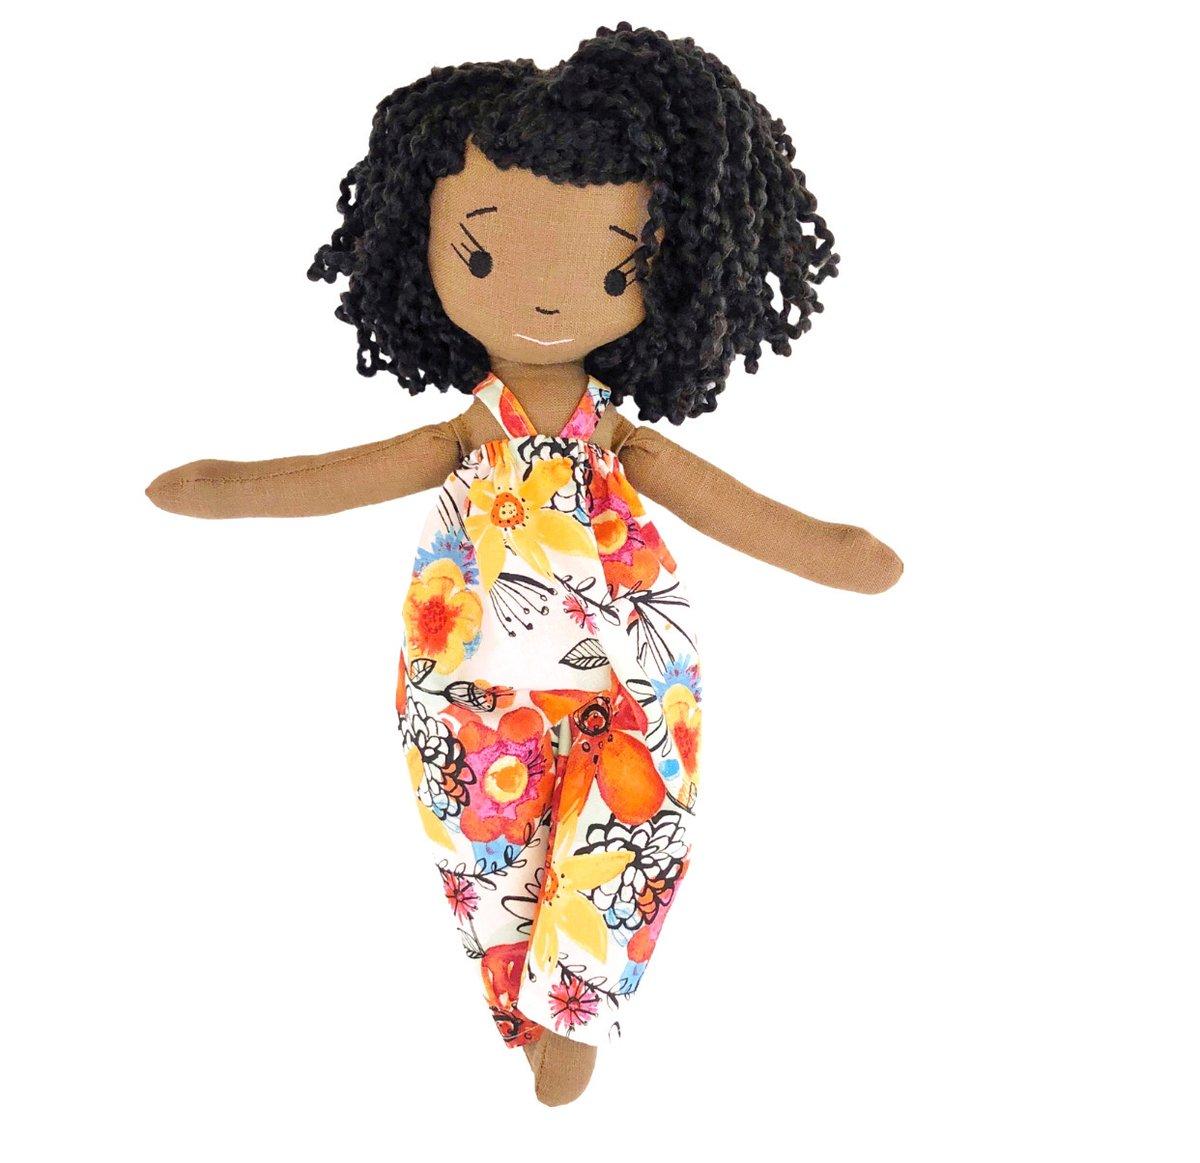 Brenn Handmade Keepsake Doll (PLEASE NOTE: THIS ORDER WILL SHIP ON OR BEFORE NOV 30TH)